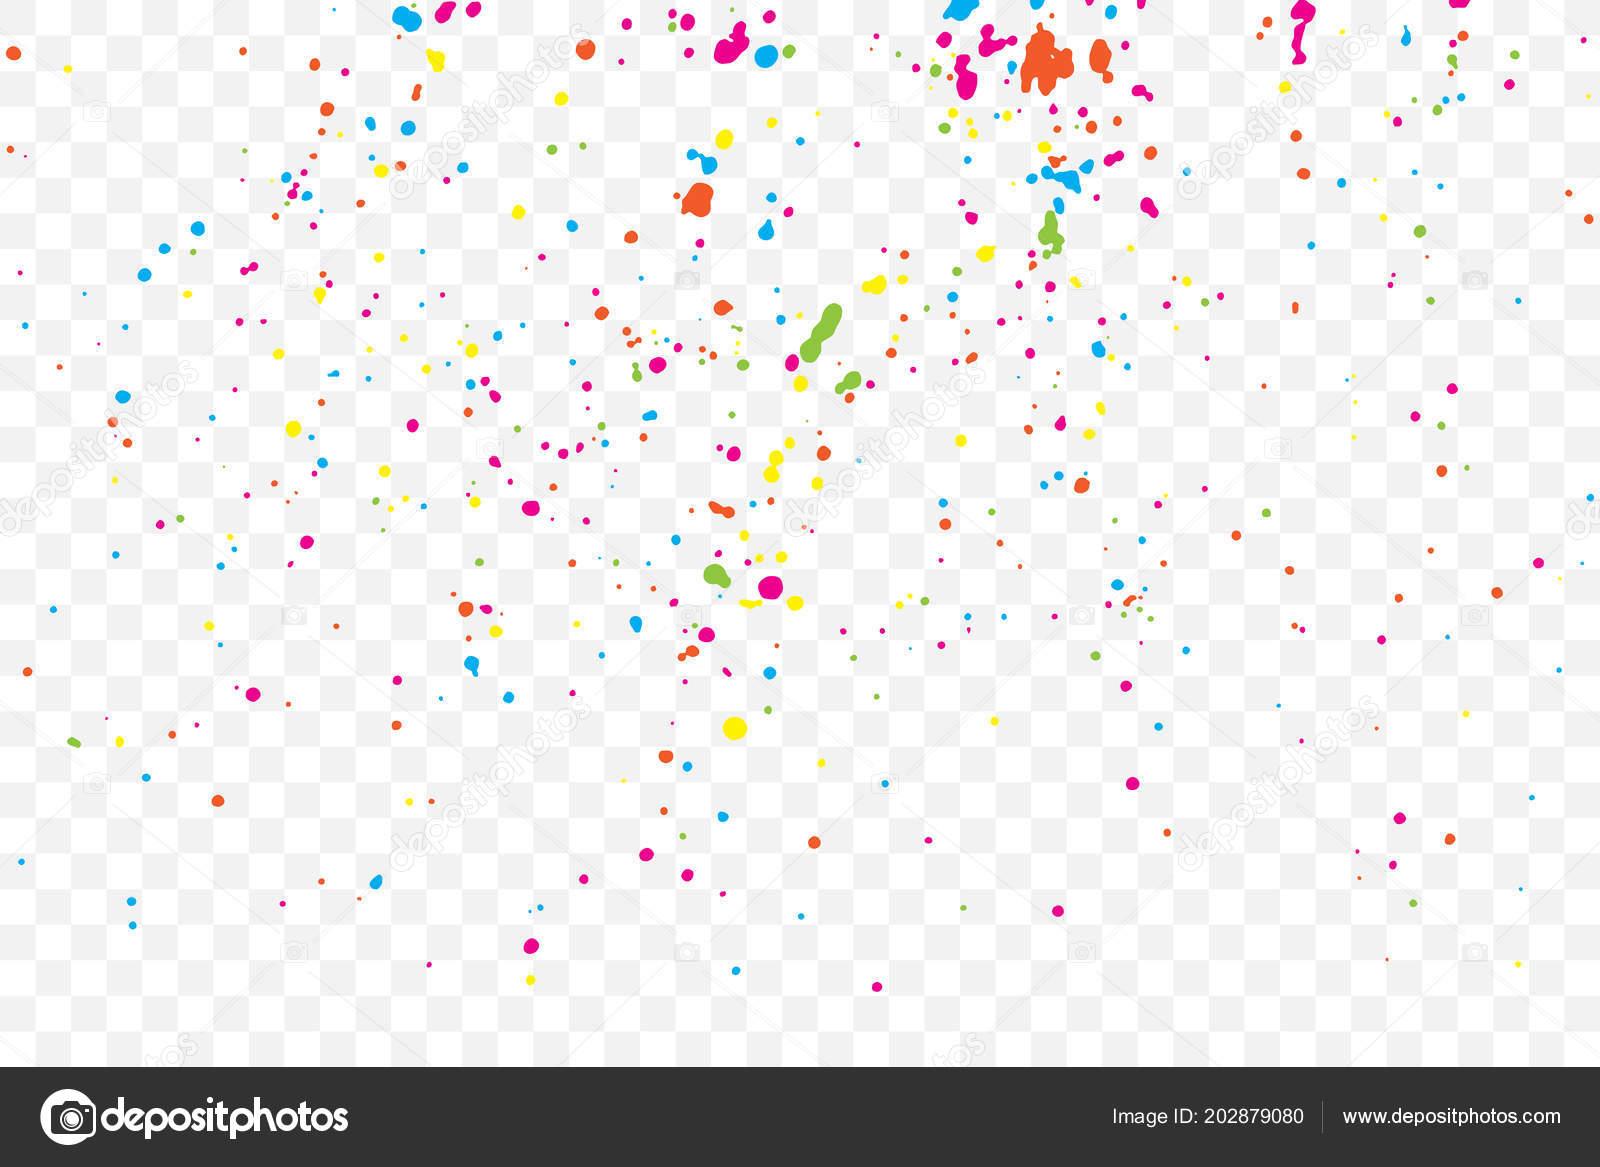 Colourful Explosion Confetti Grainy Textured Birthday Design